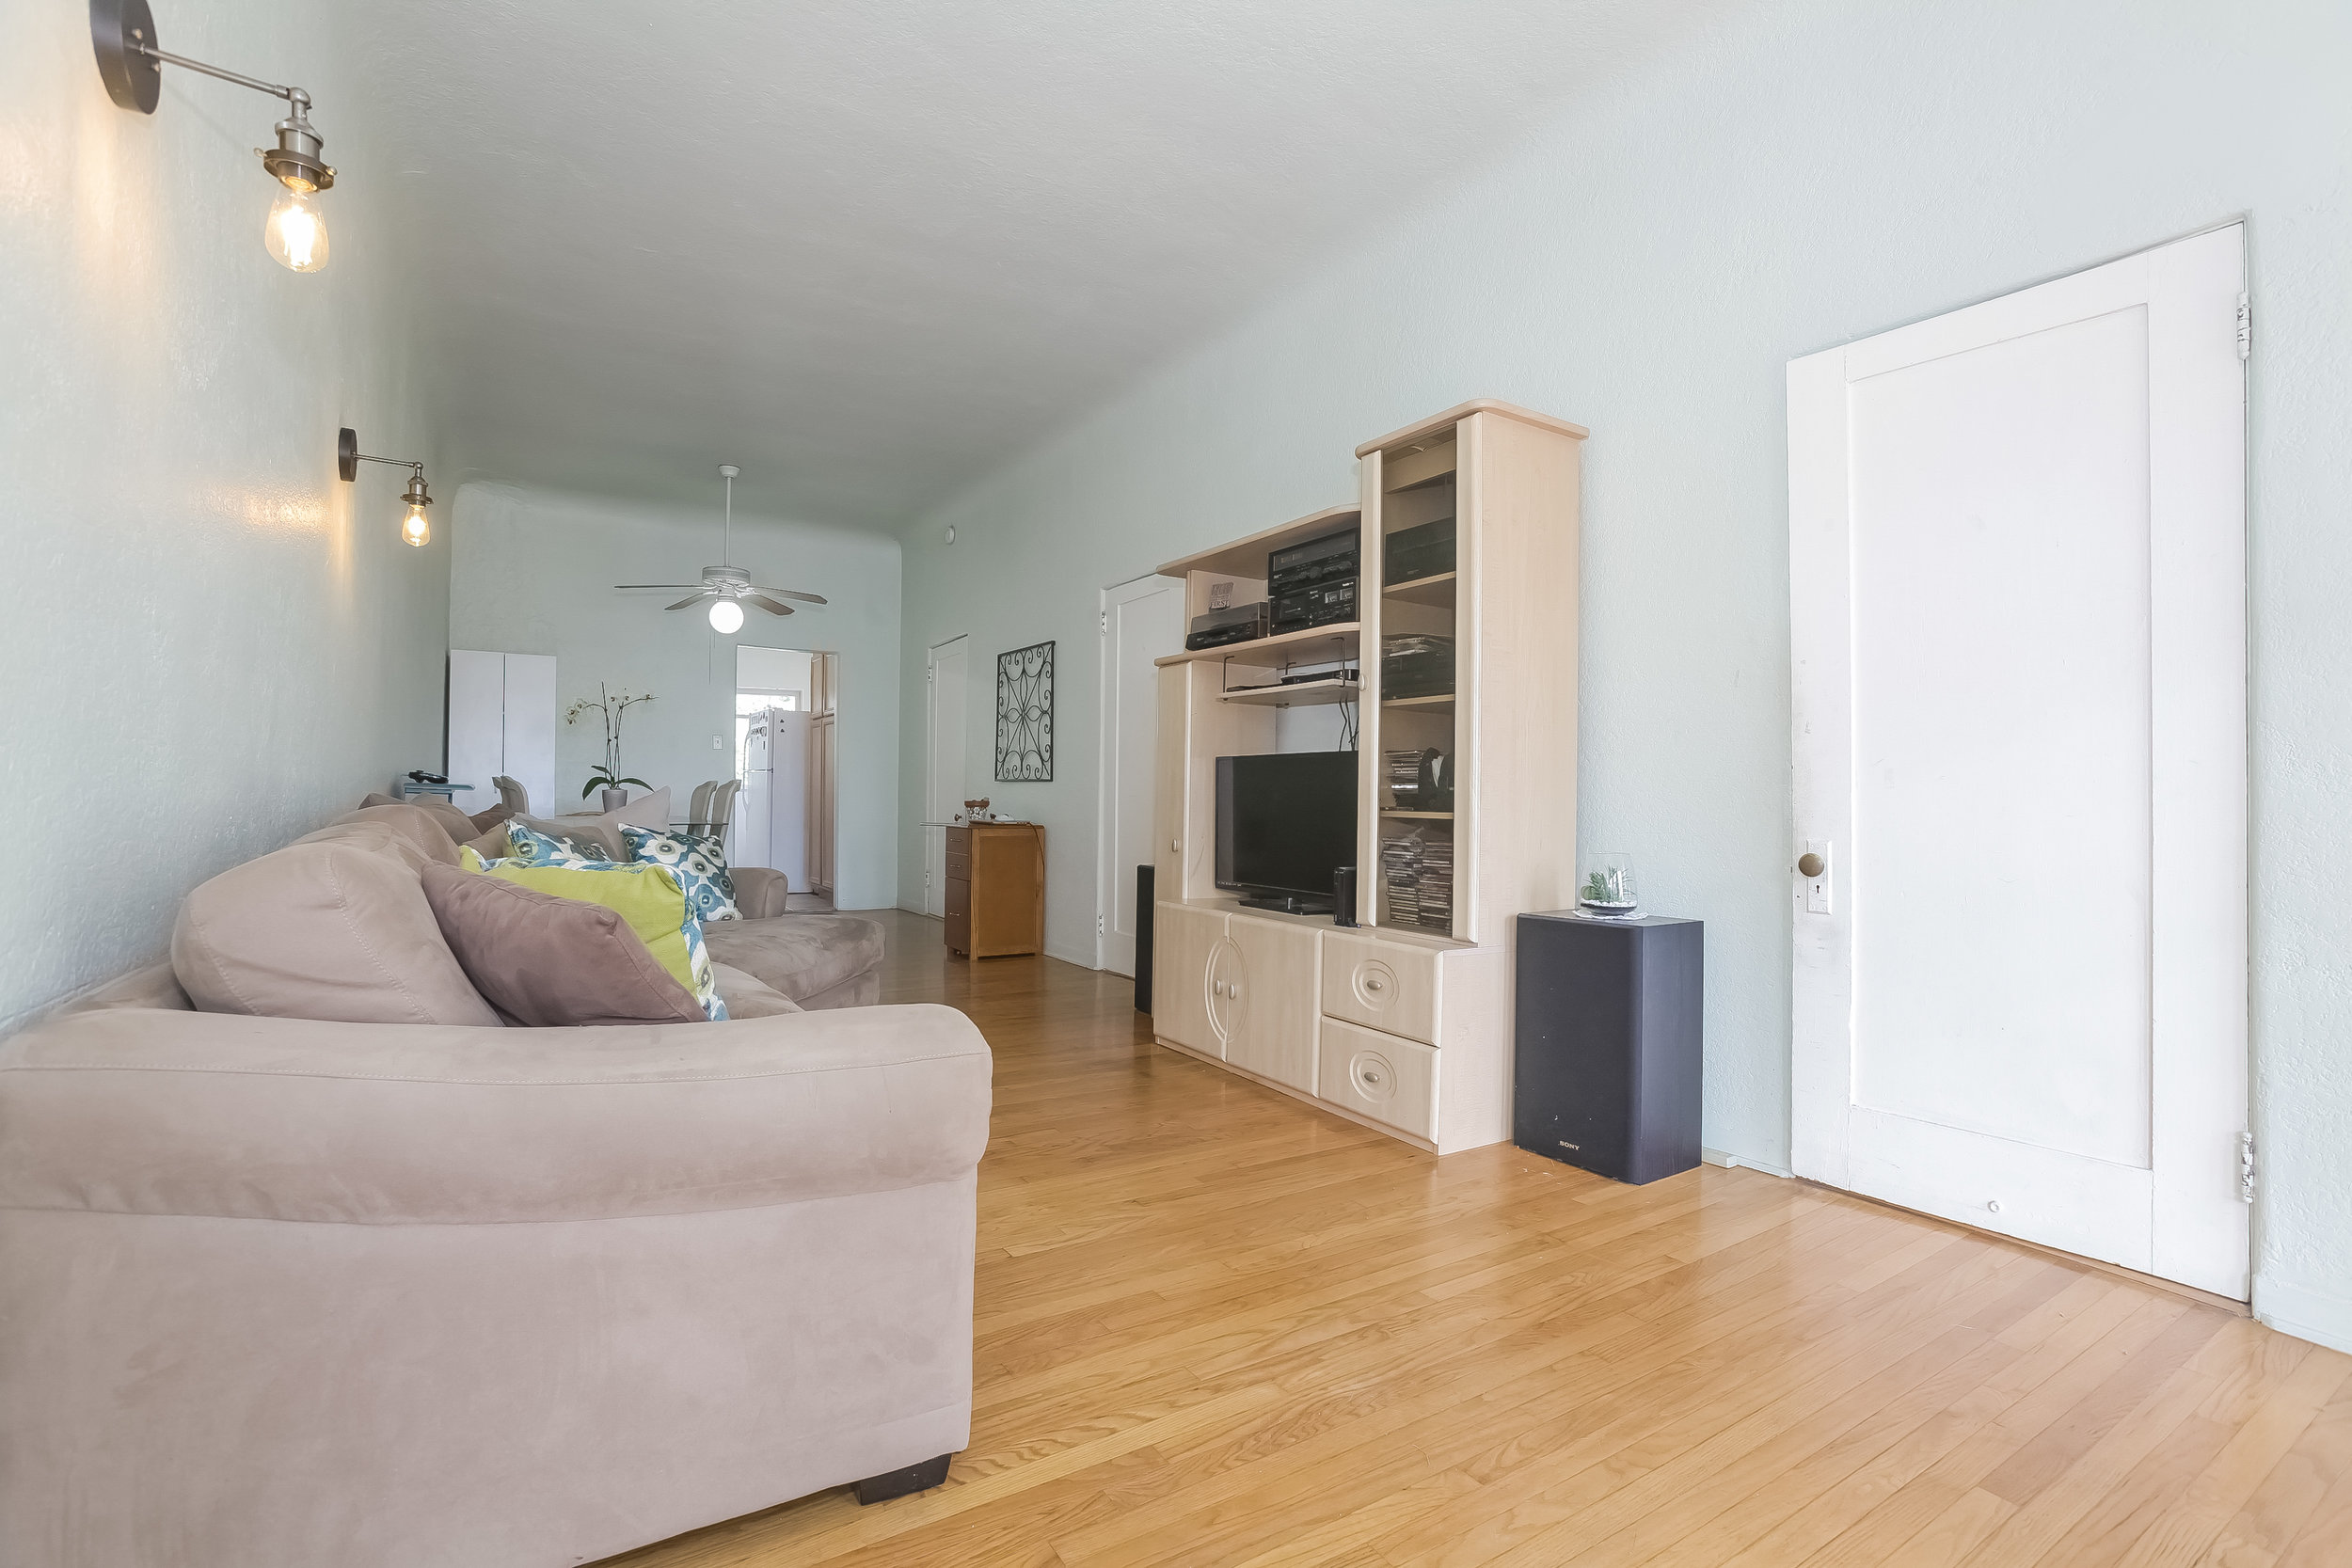 023-Living_Room-4517225-large.jpg